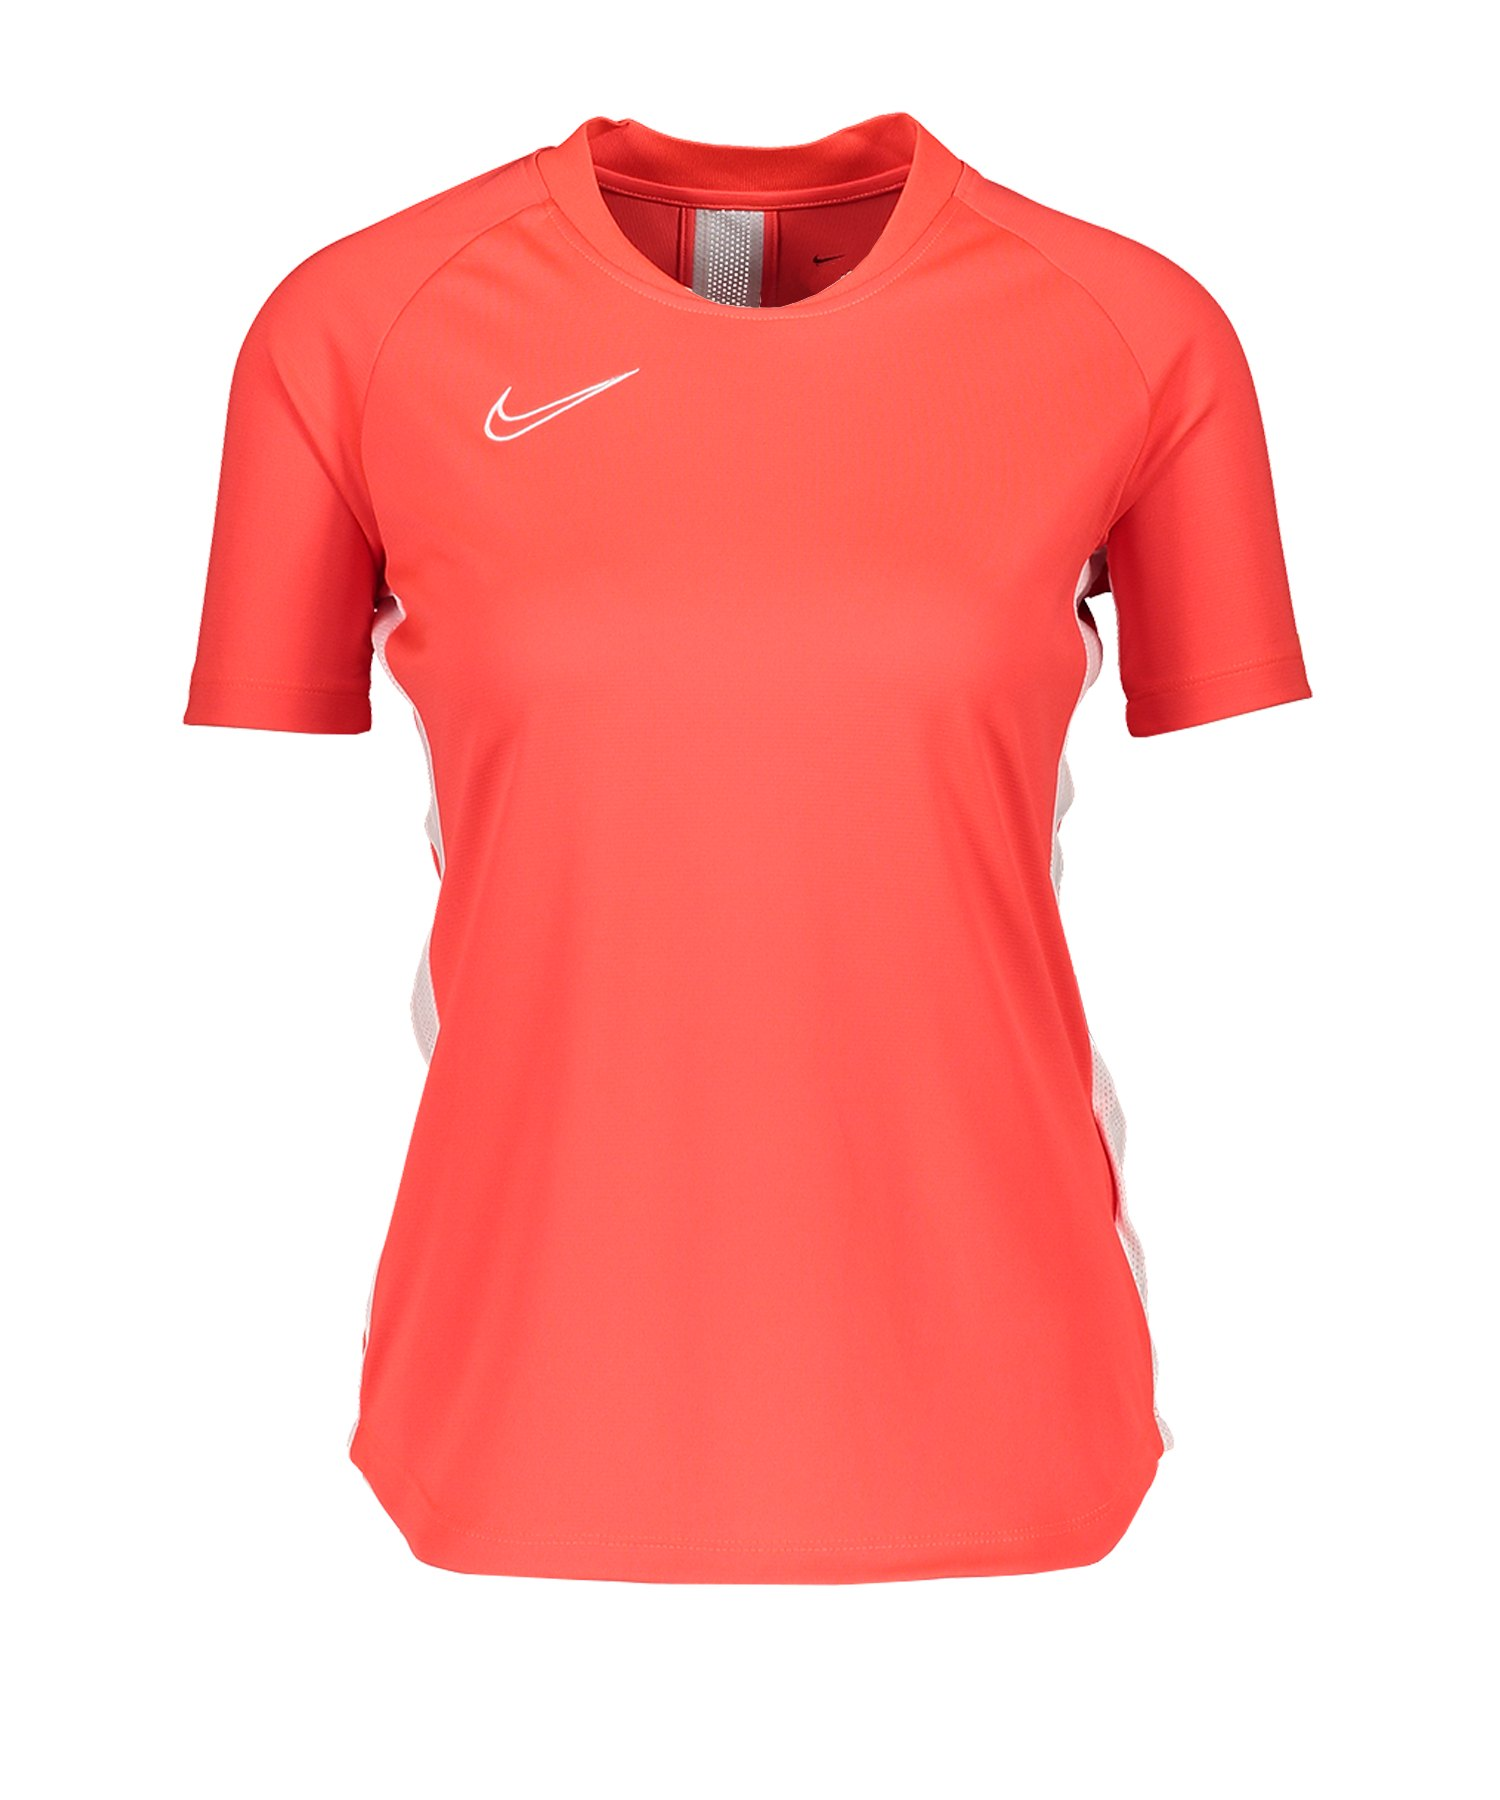 Nike Academy 19 Trainingsshirt kurzarm Damen F671 - rot